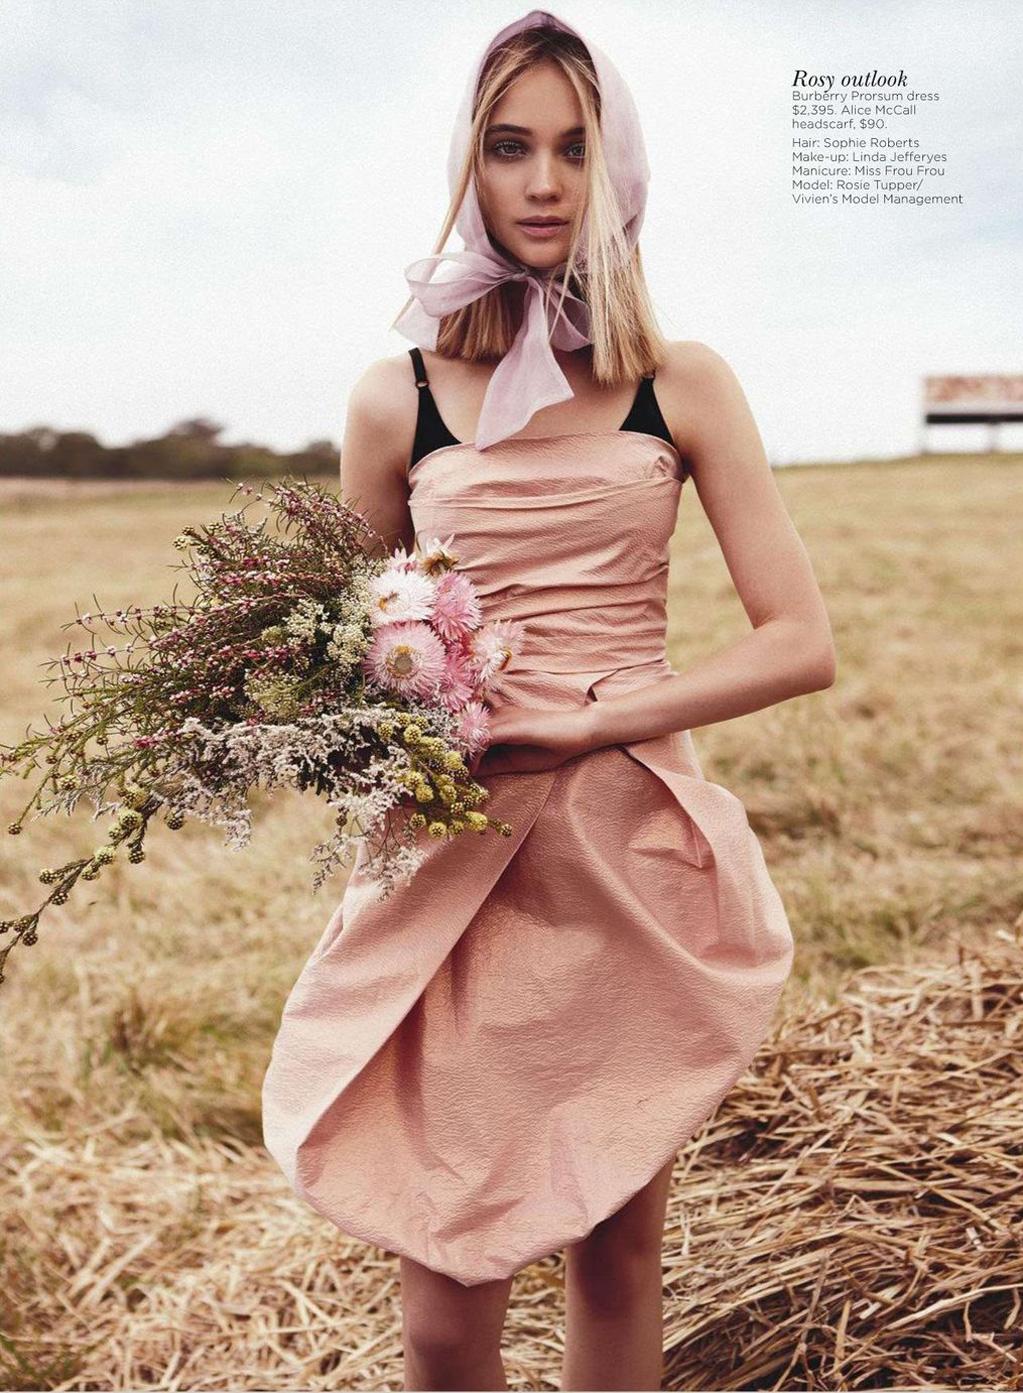 Field of Dreams Rosie Tupper by Nicole Bentley for Vogue Australia 1